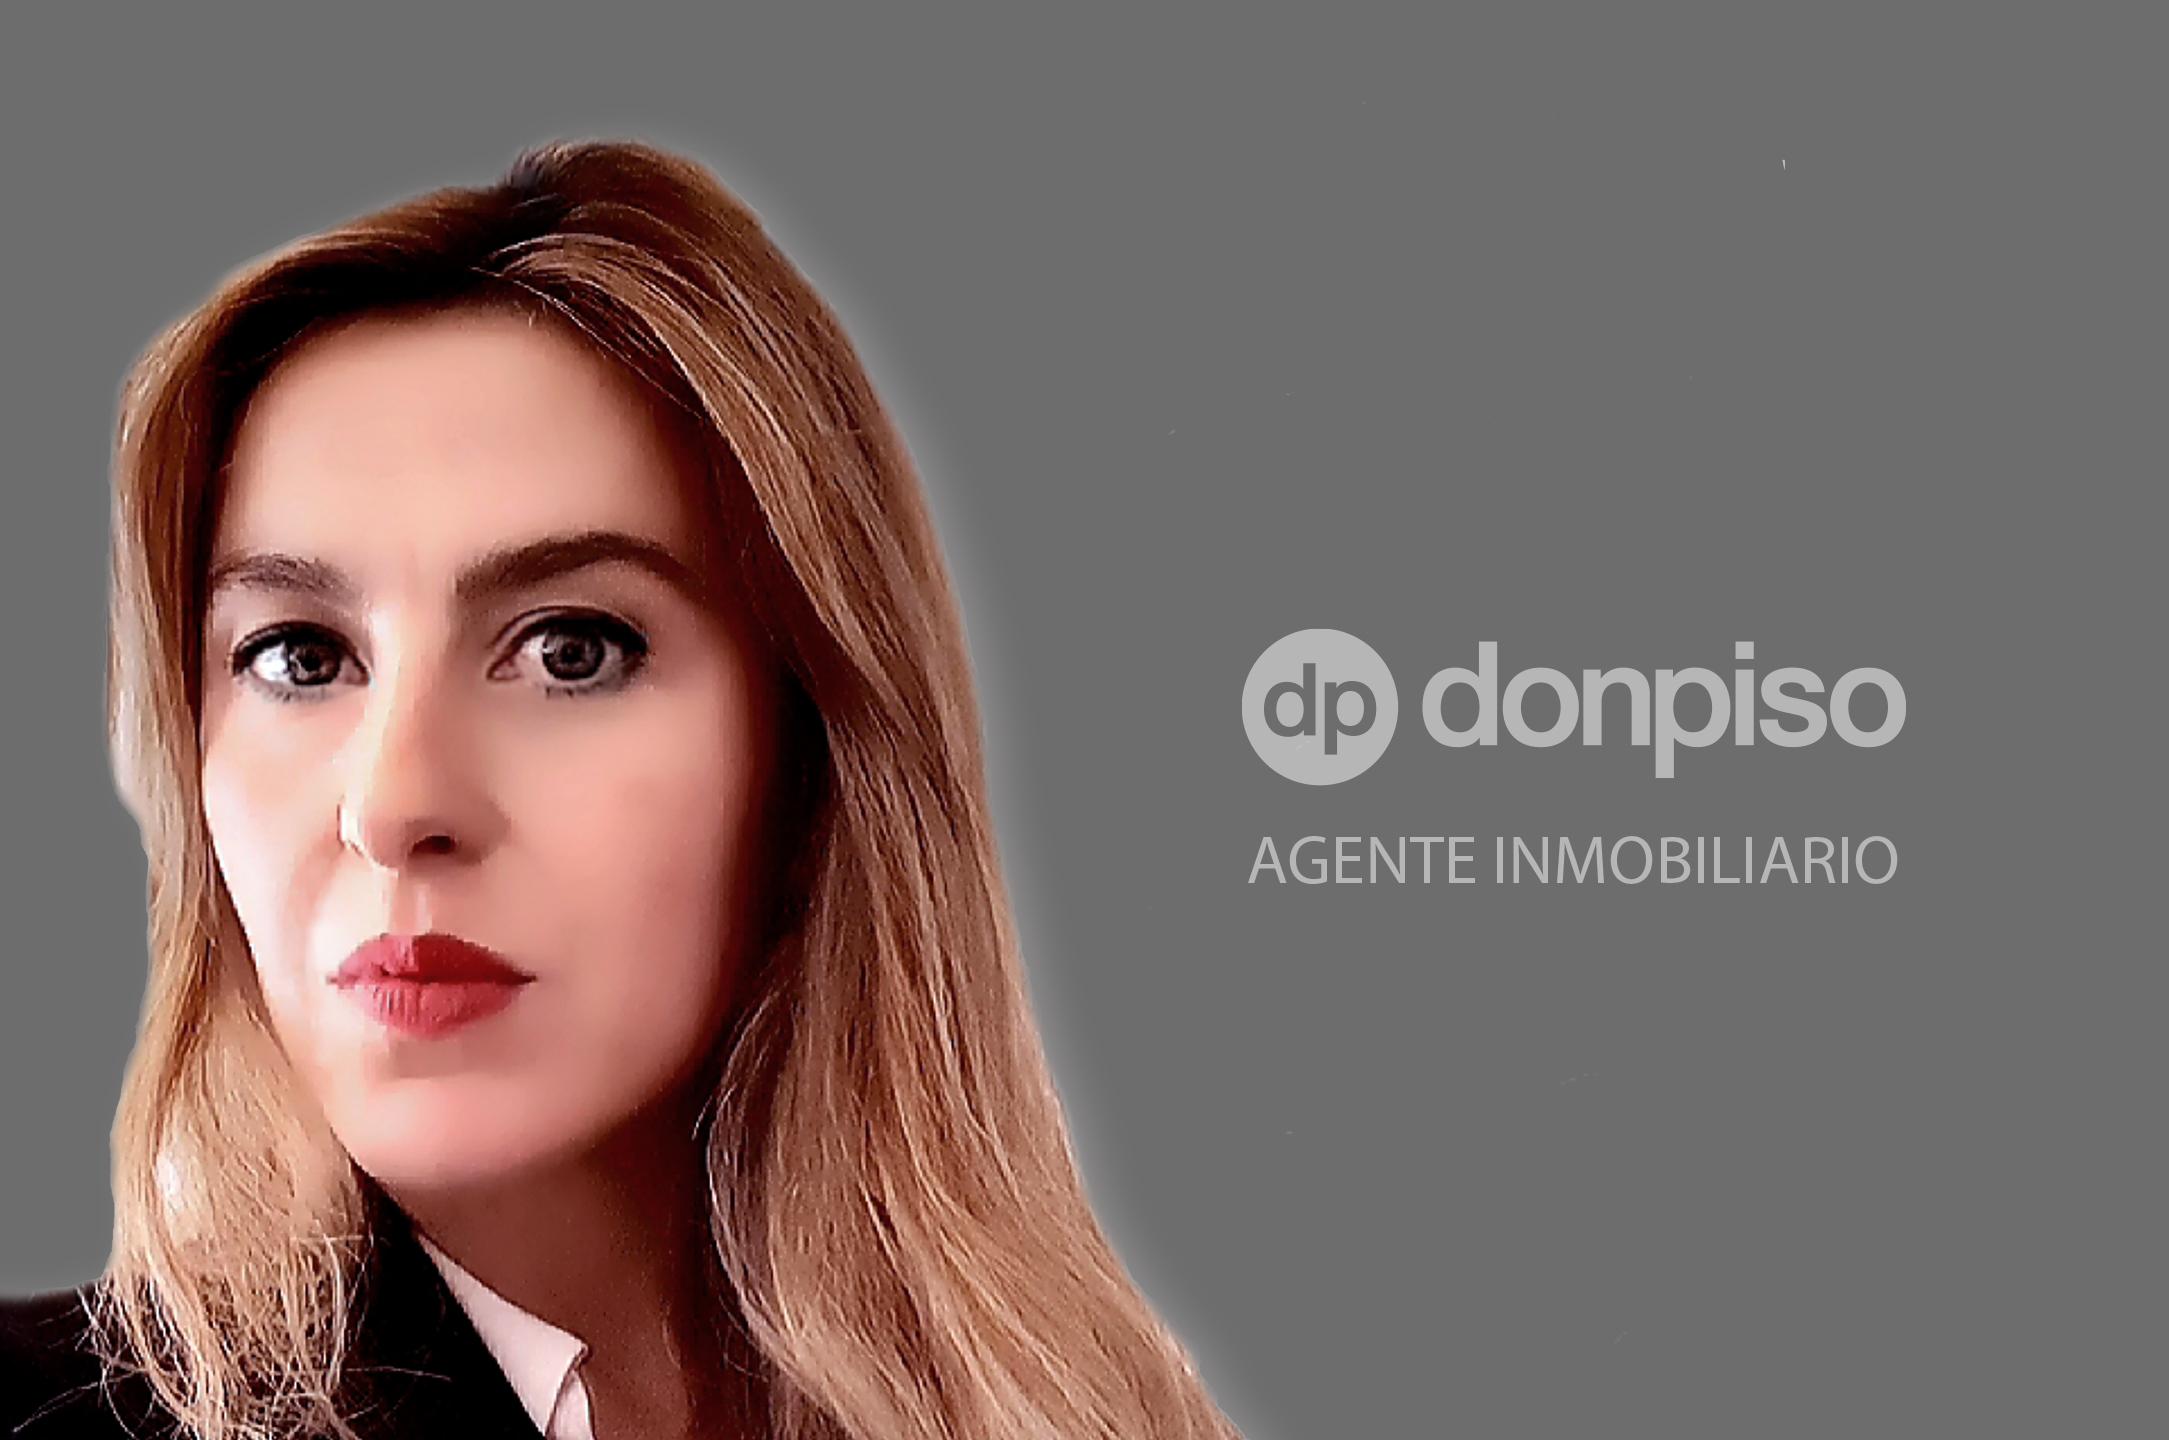 oficina donpiso Carmen Noguera